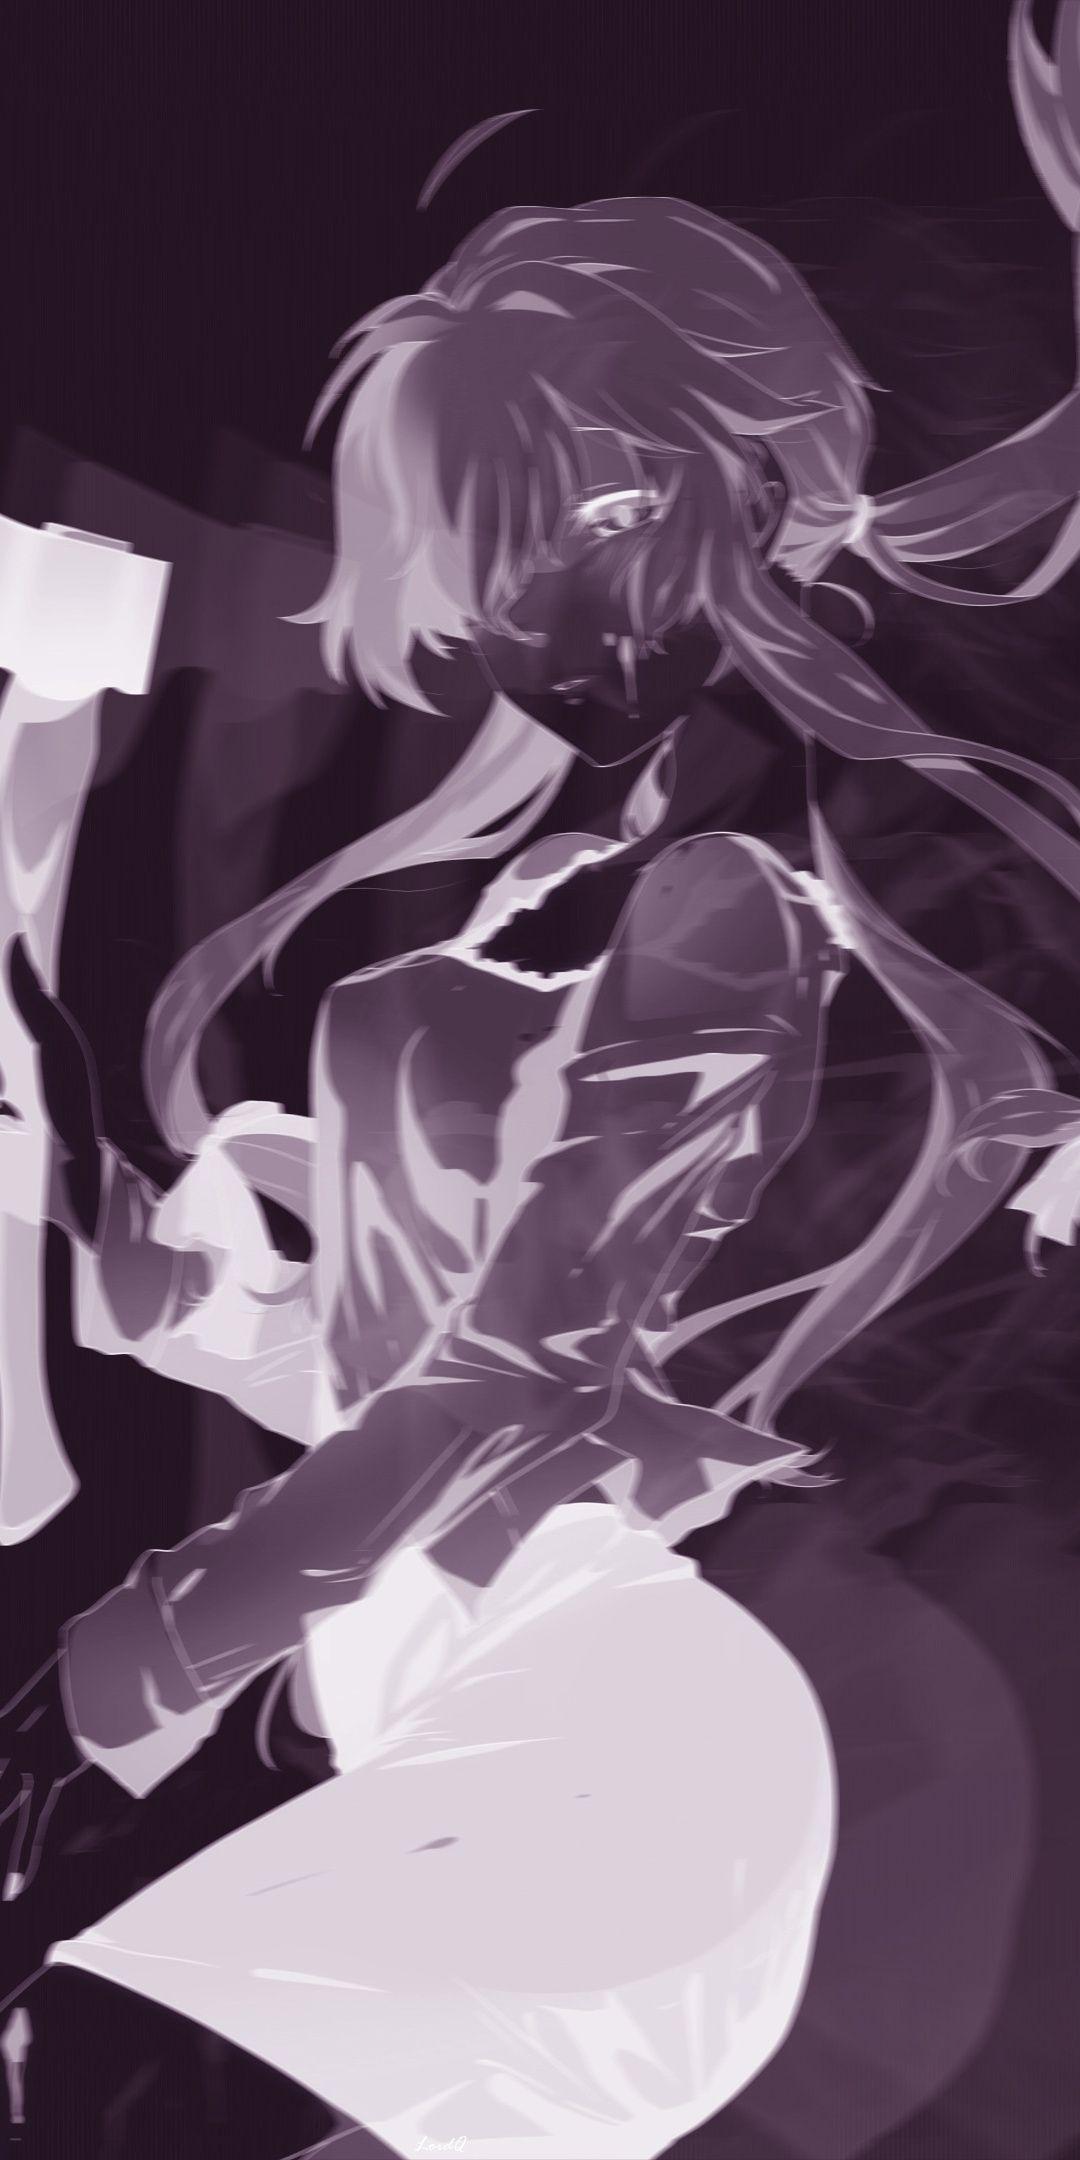 Anime Girl Mirai Nikki Minimal 1080x2160 Wallpaper Anime